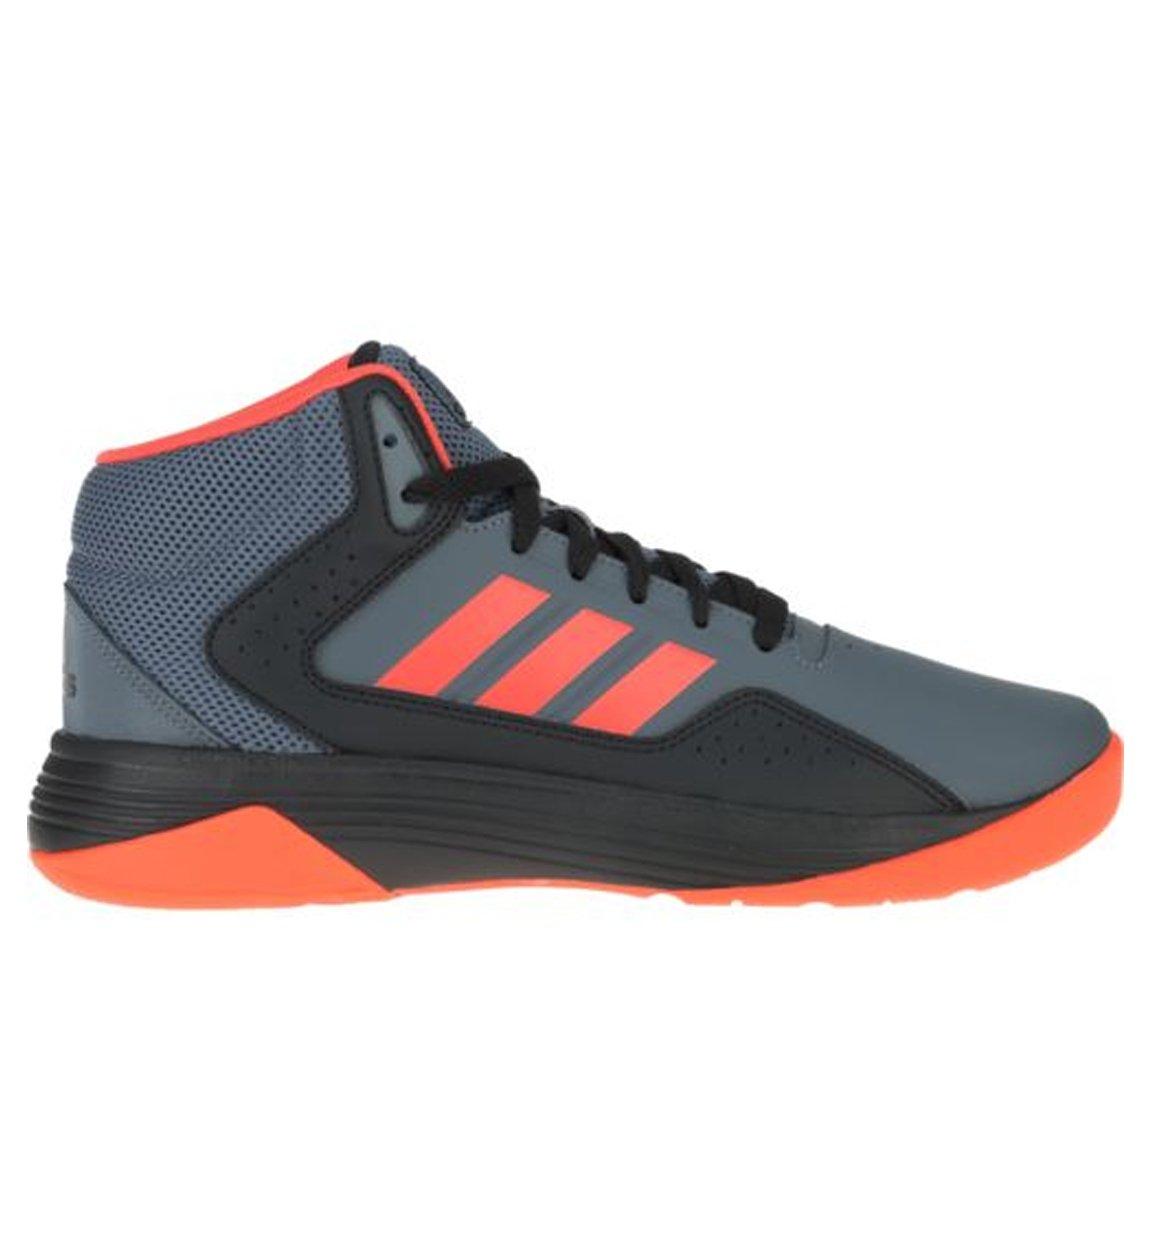 7556880ef74ac Galleon - Adidas Kids Boy s Cloudfoam Ilation (Little Kid Big Kid)  Onix Bright Red Core Black Athletic Shoe